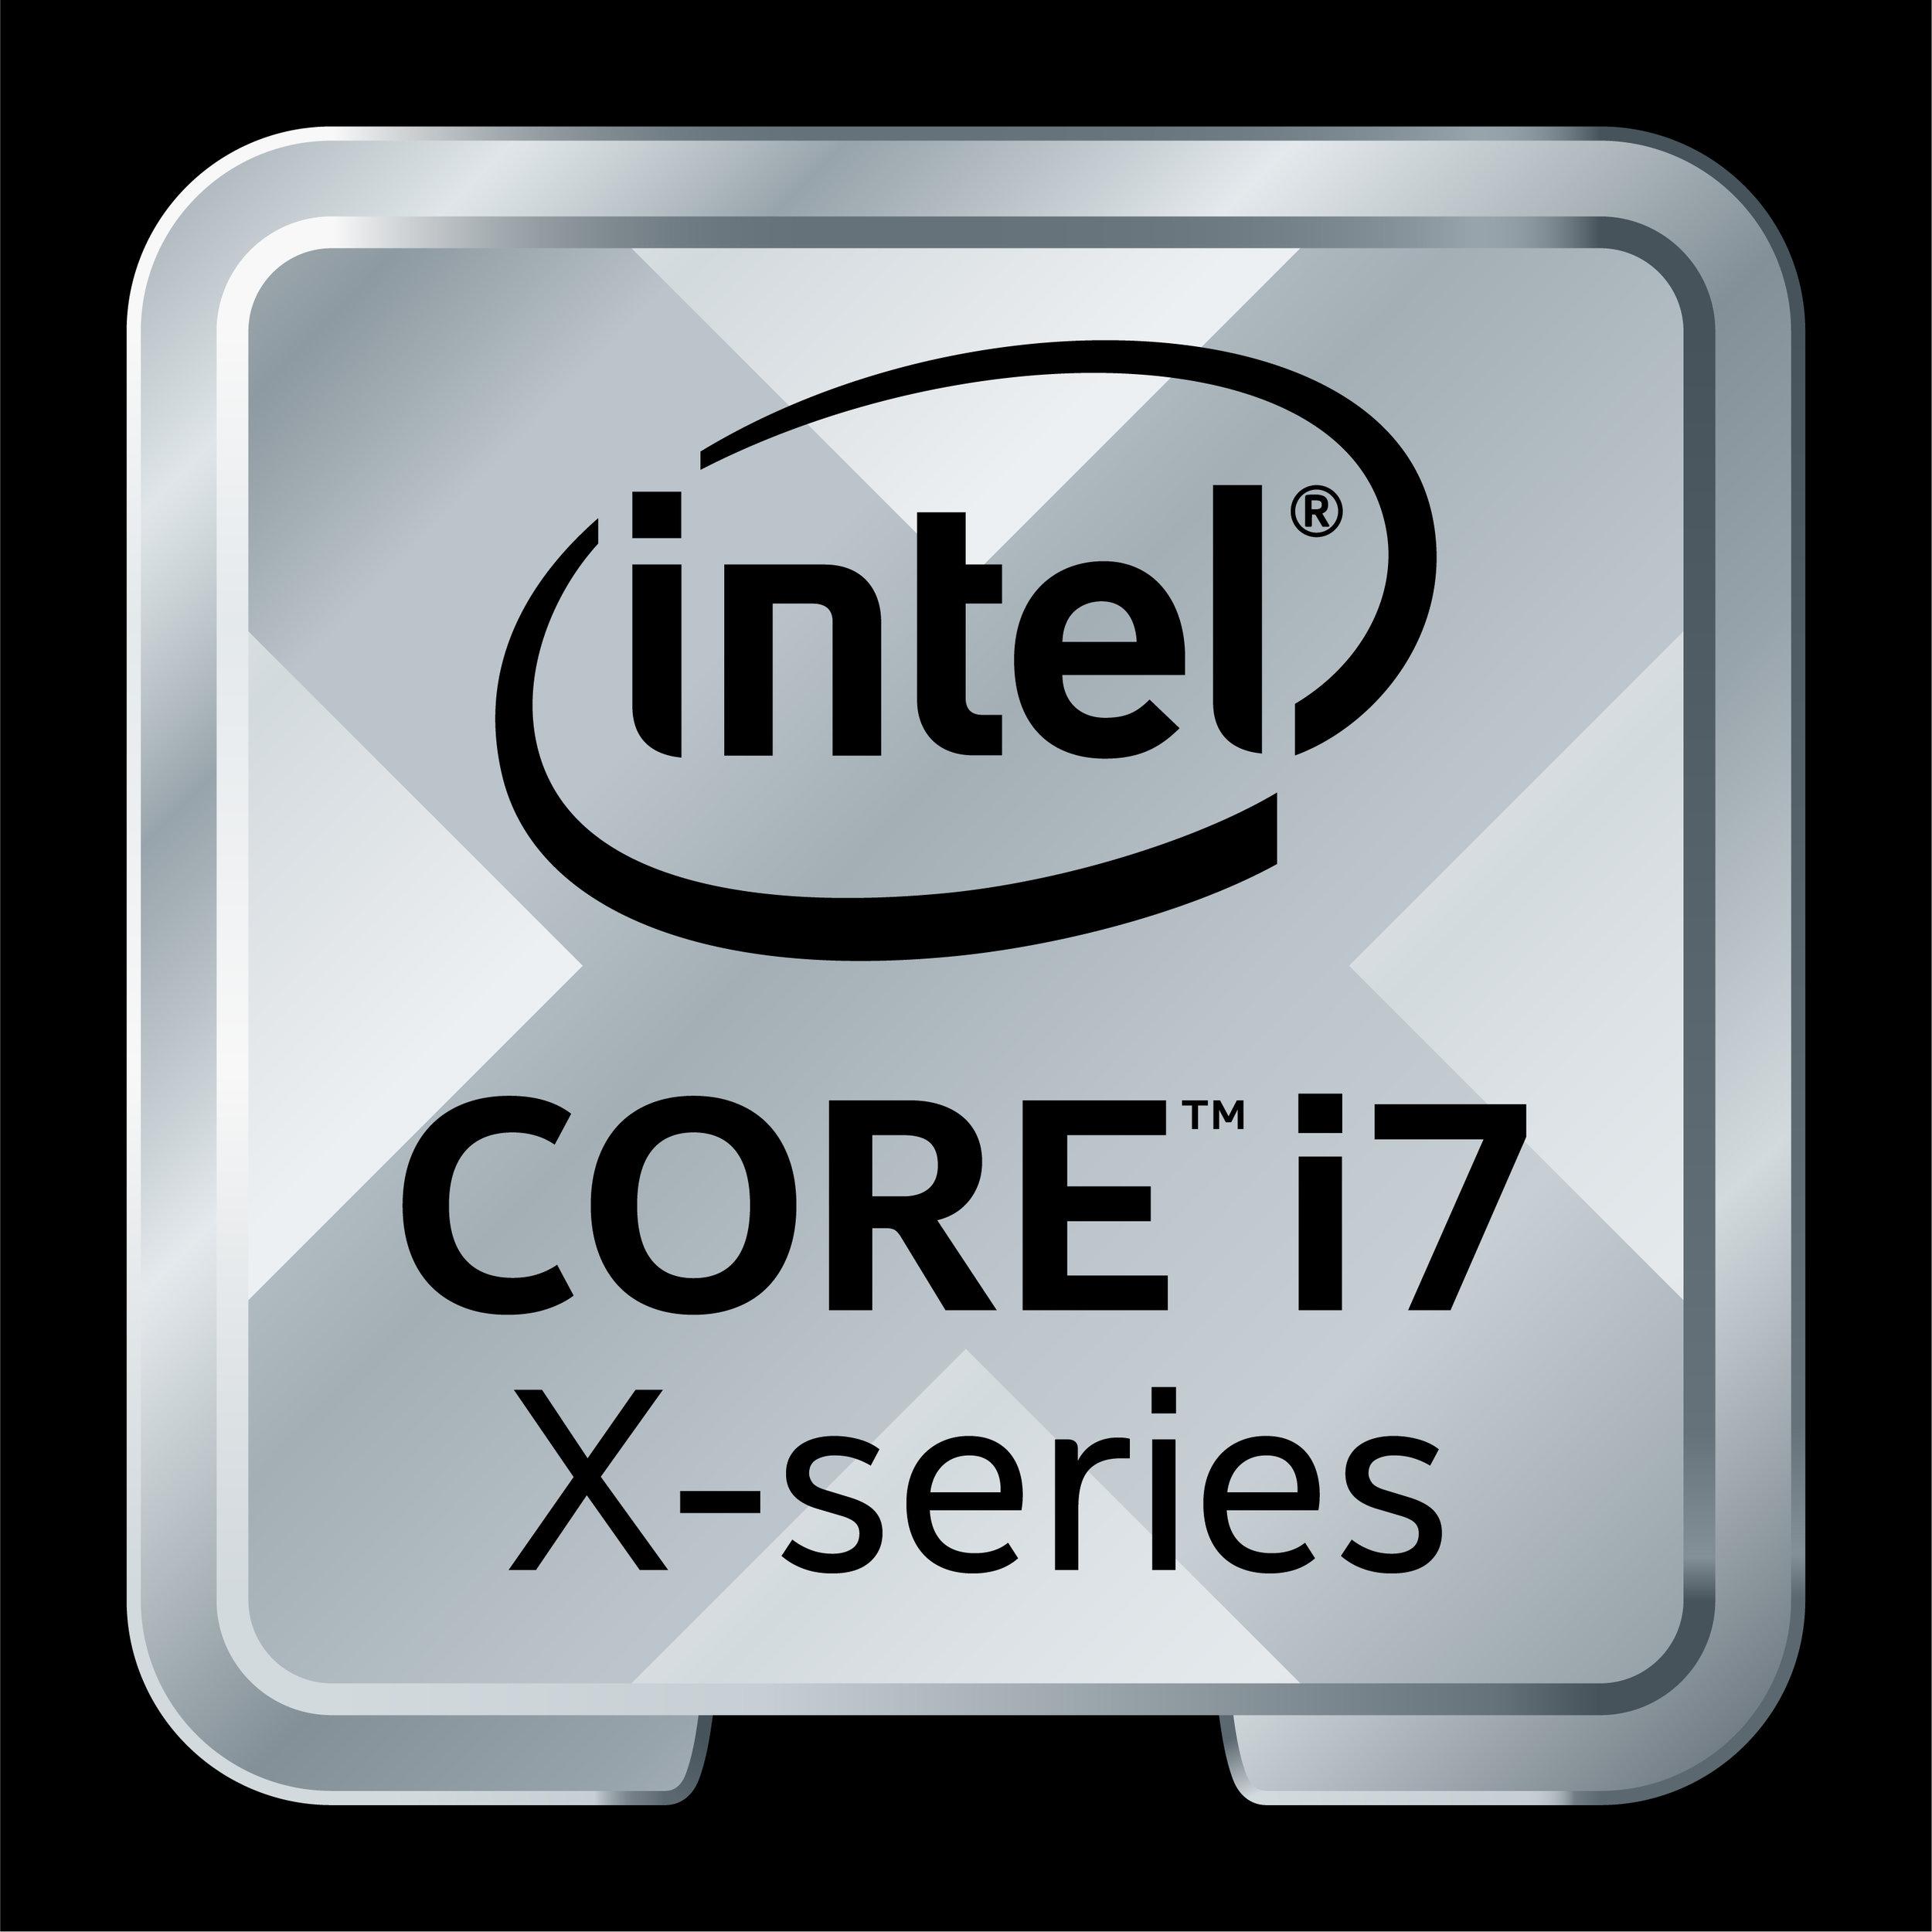 Intel i9 series